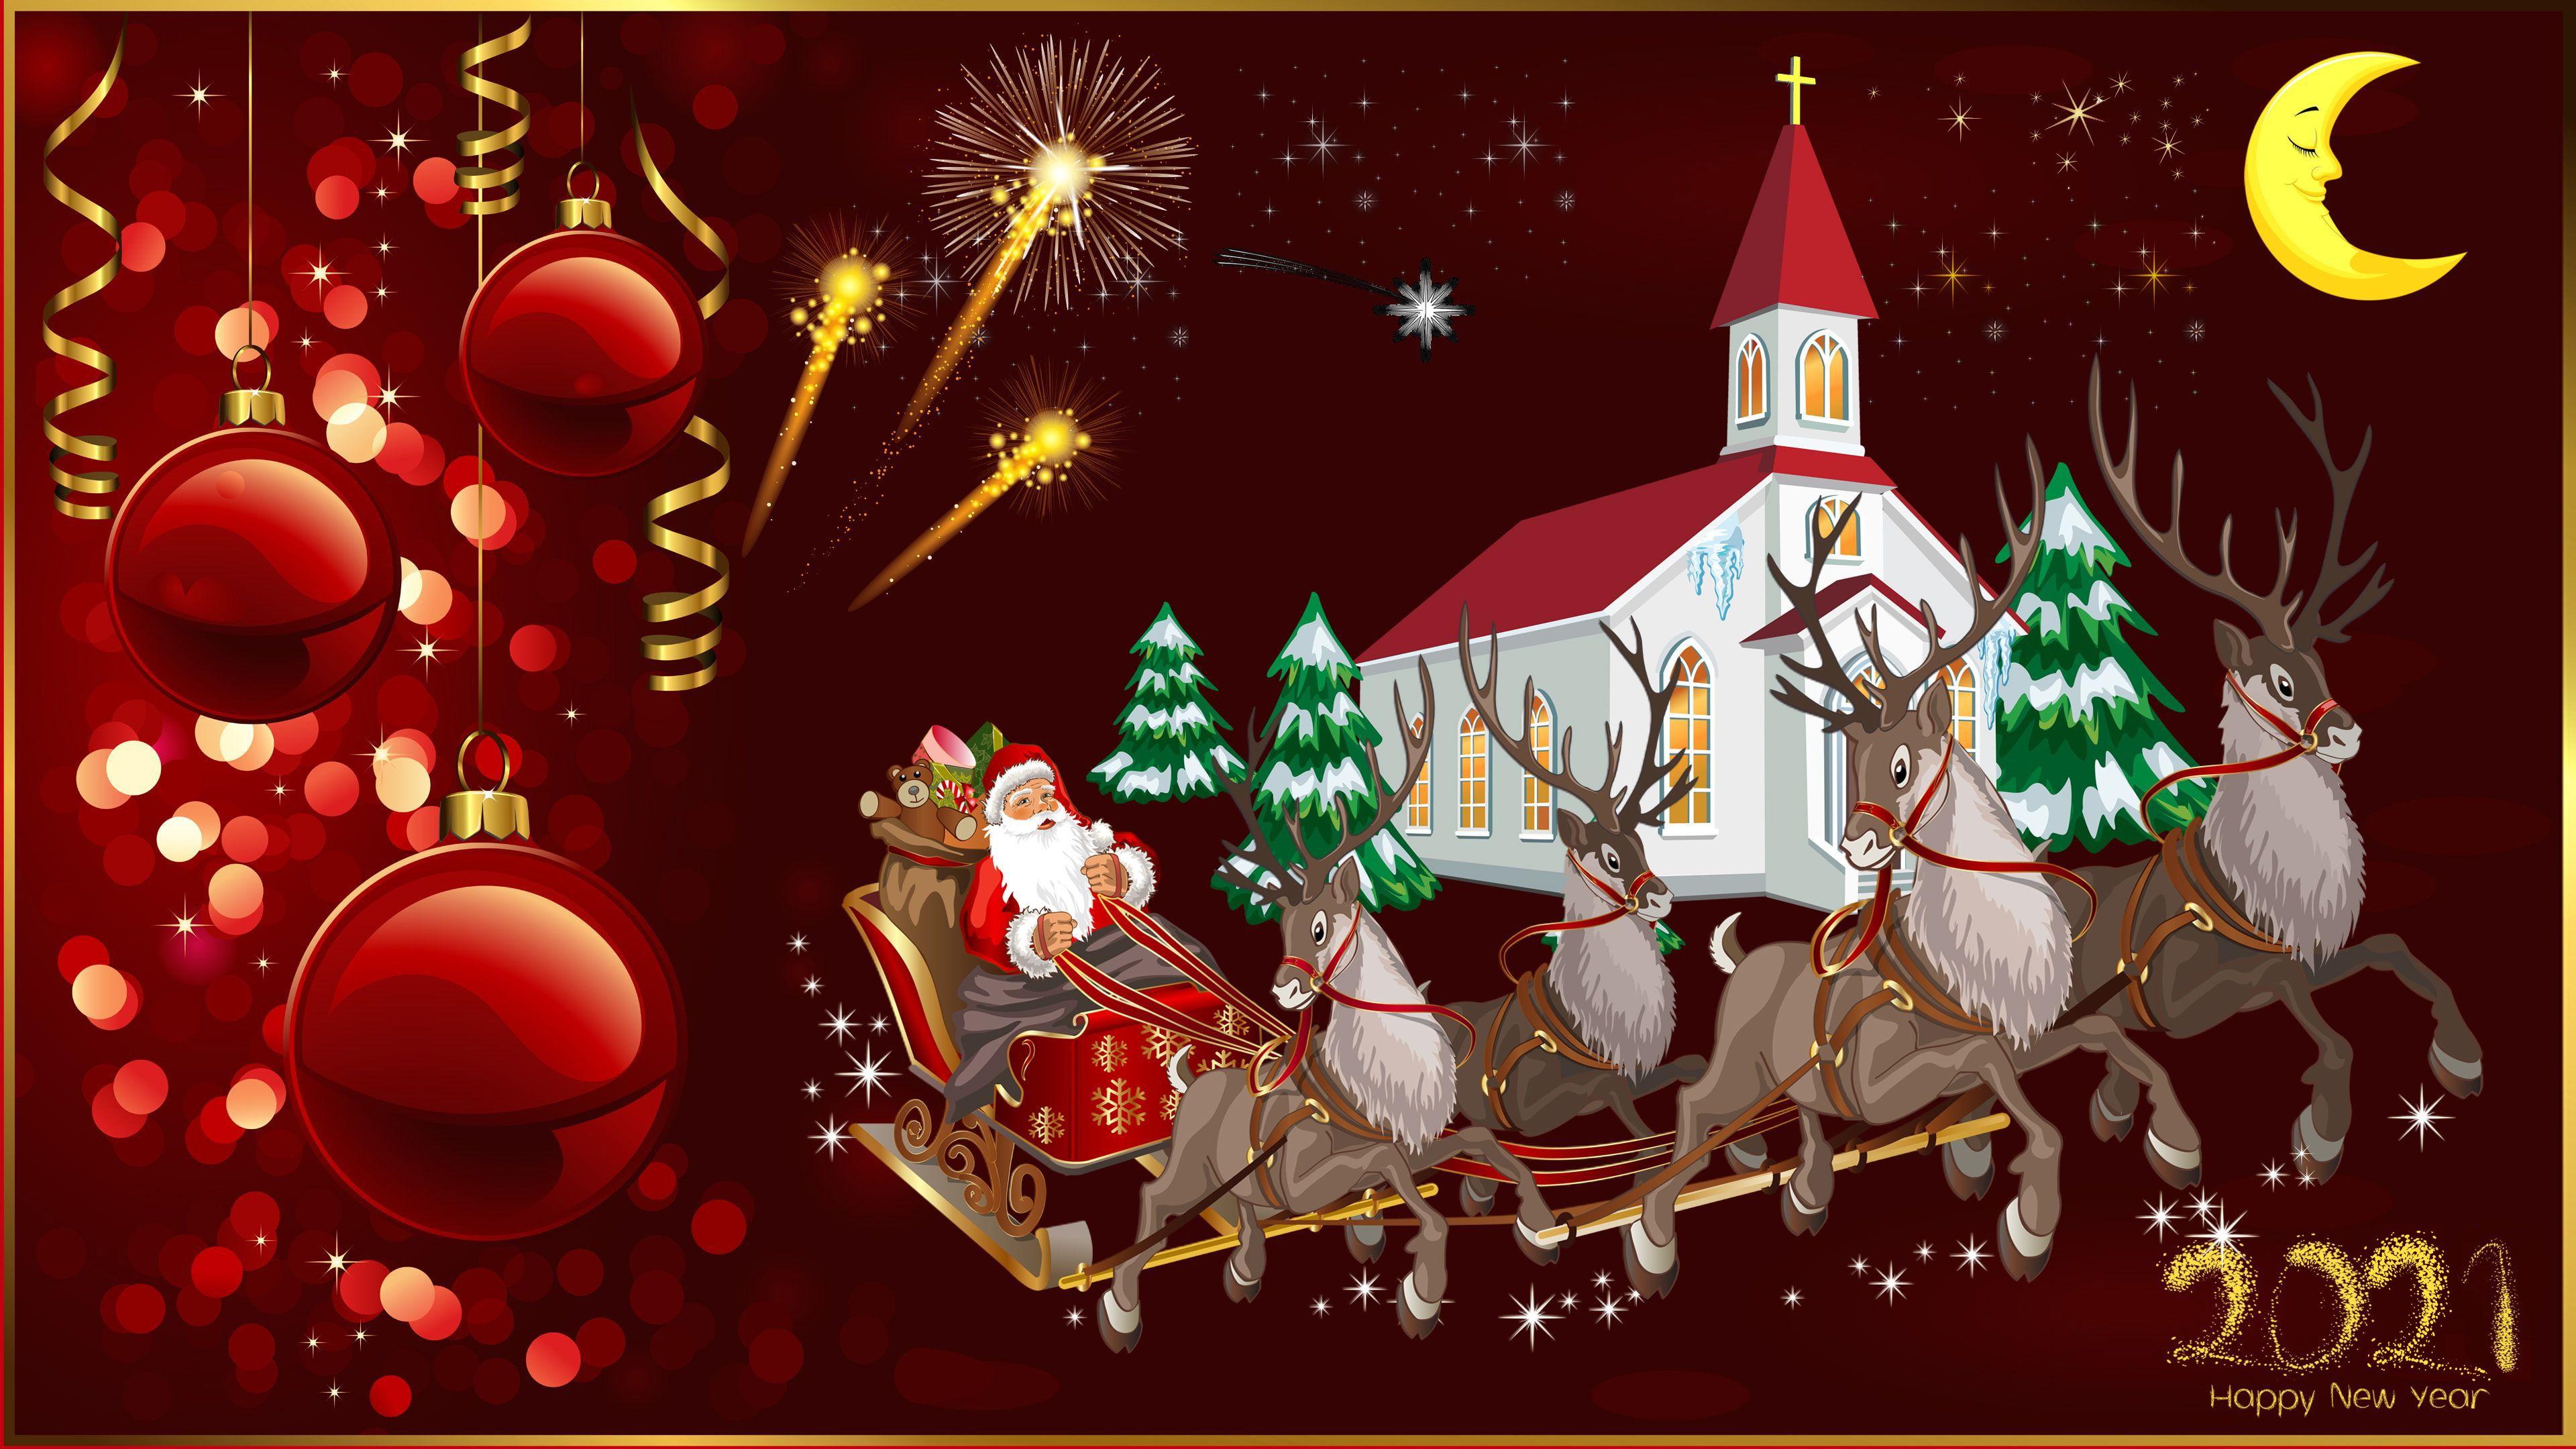 2021 Christmas Images Wallpaper For Desktop Merry Christmas 2021 Wallpapers Wallpaper Cave